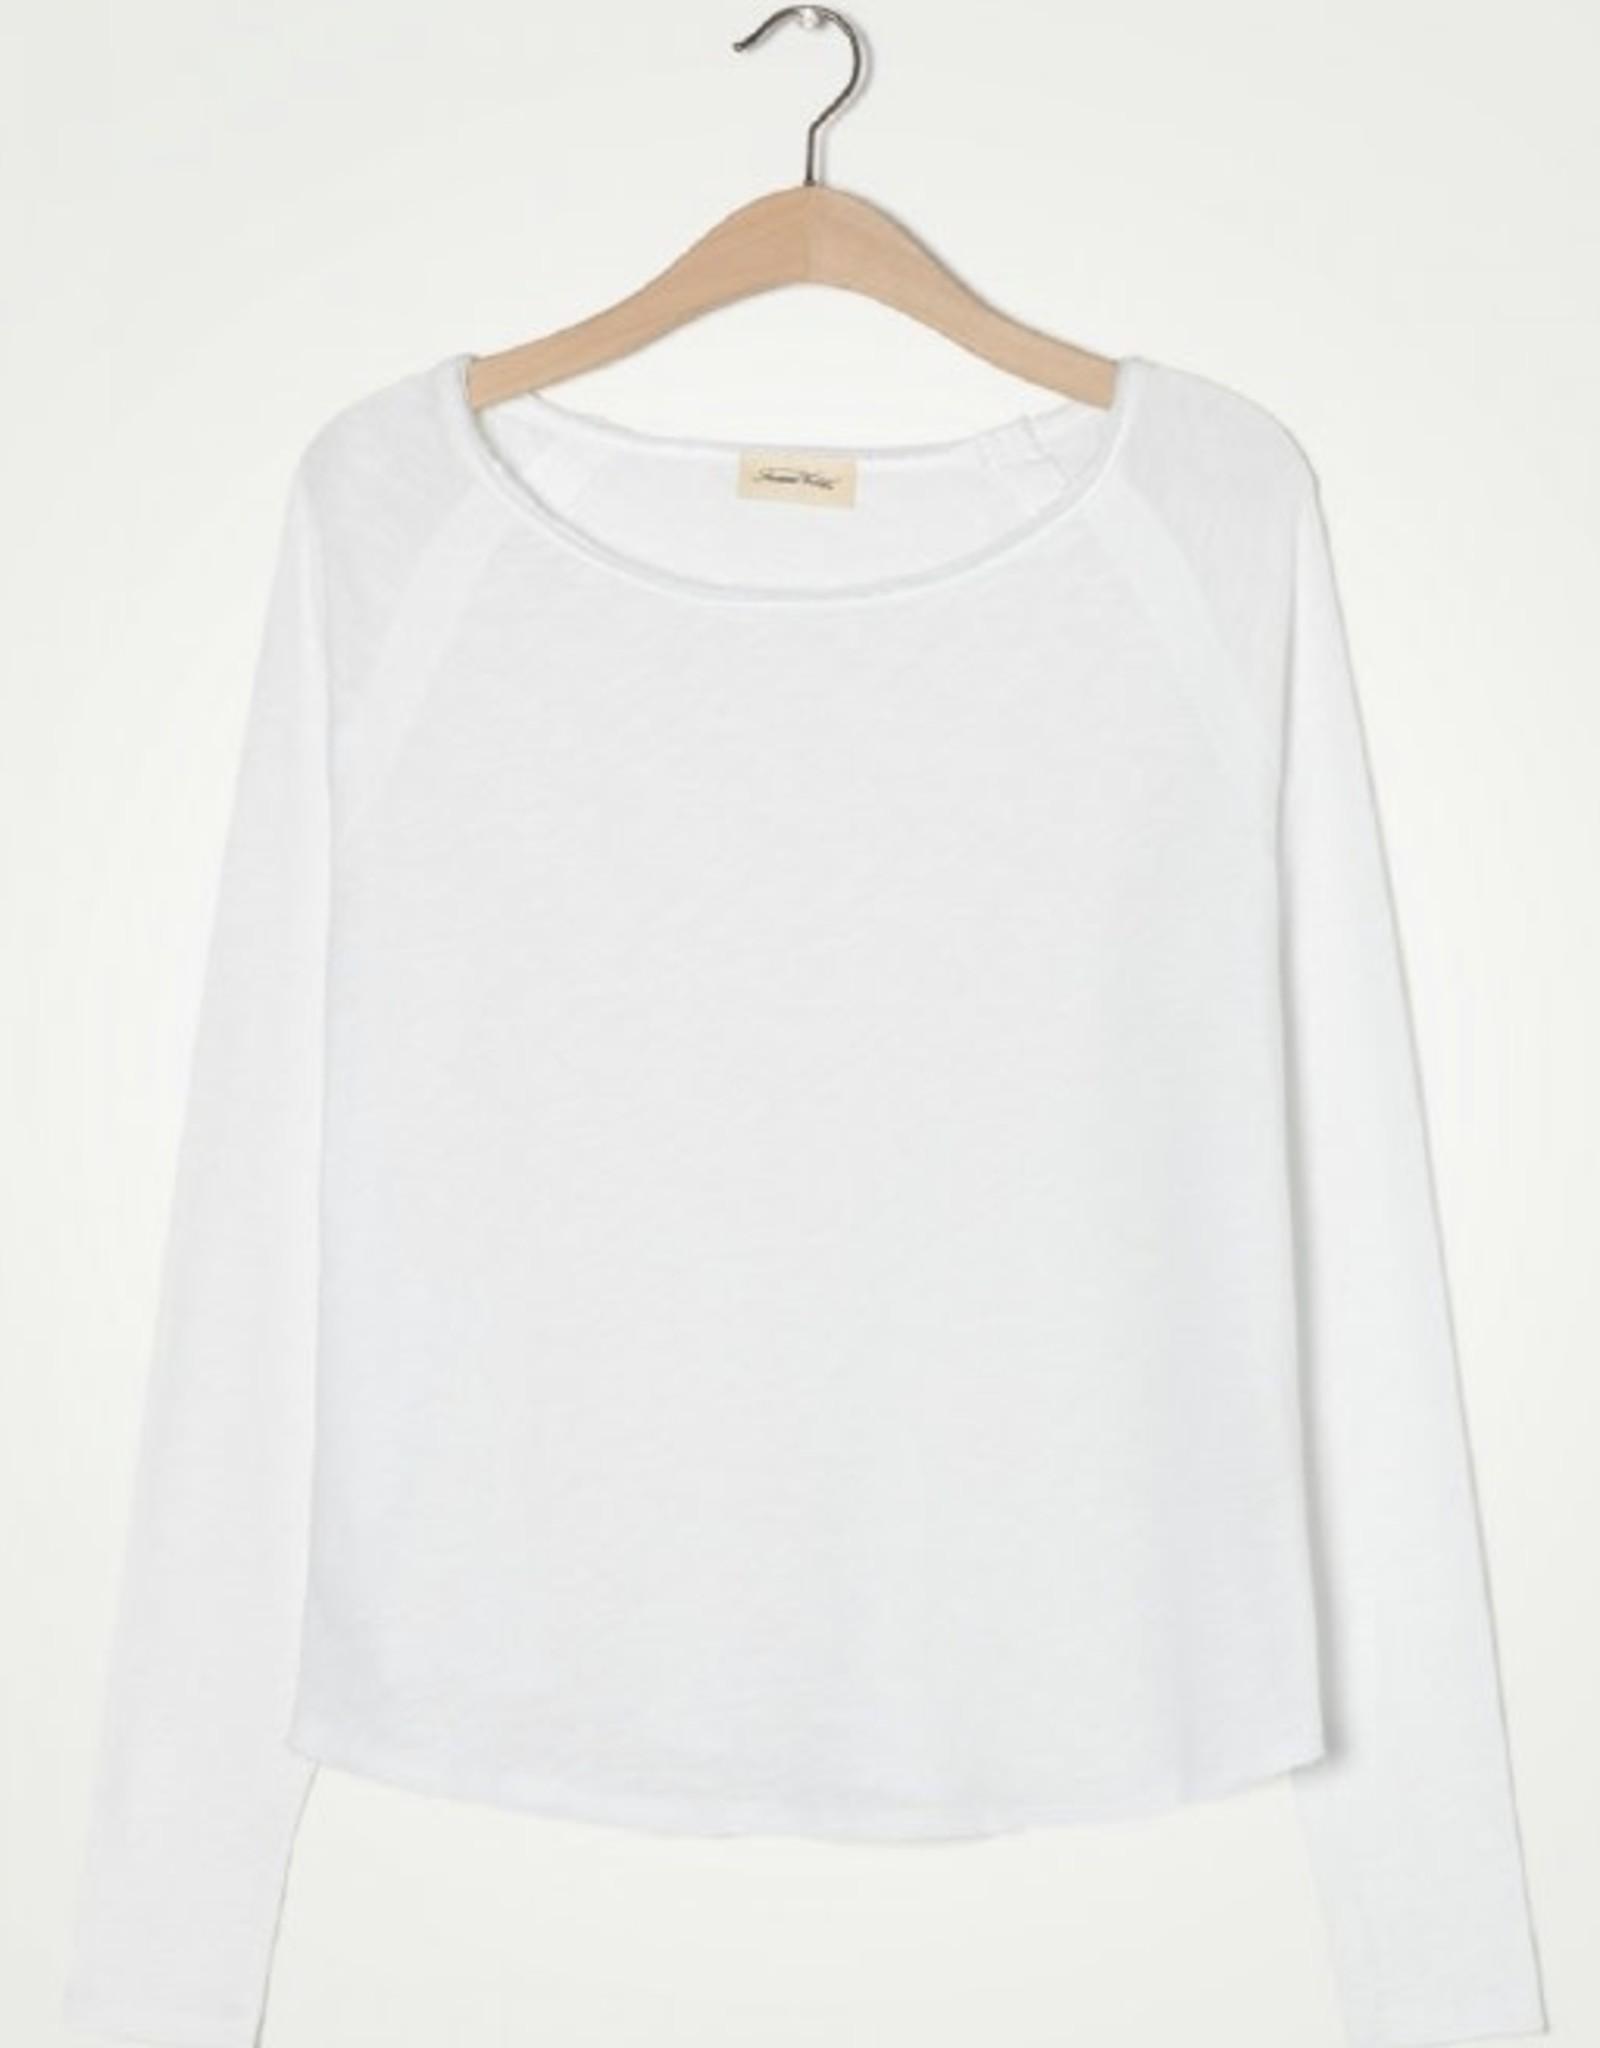 American Vintage T-shirt 'Sonoma' Boothals Lange mouwen - Wit - American Vintage